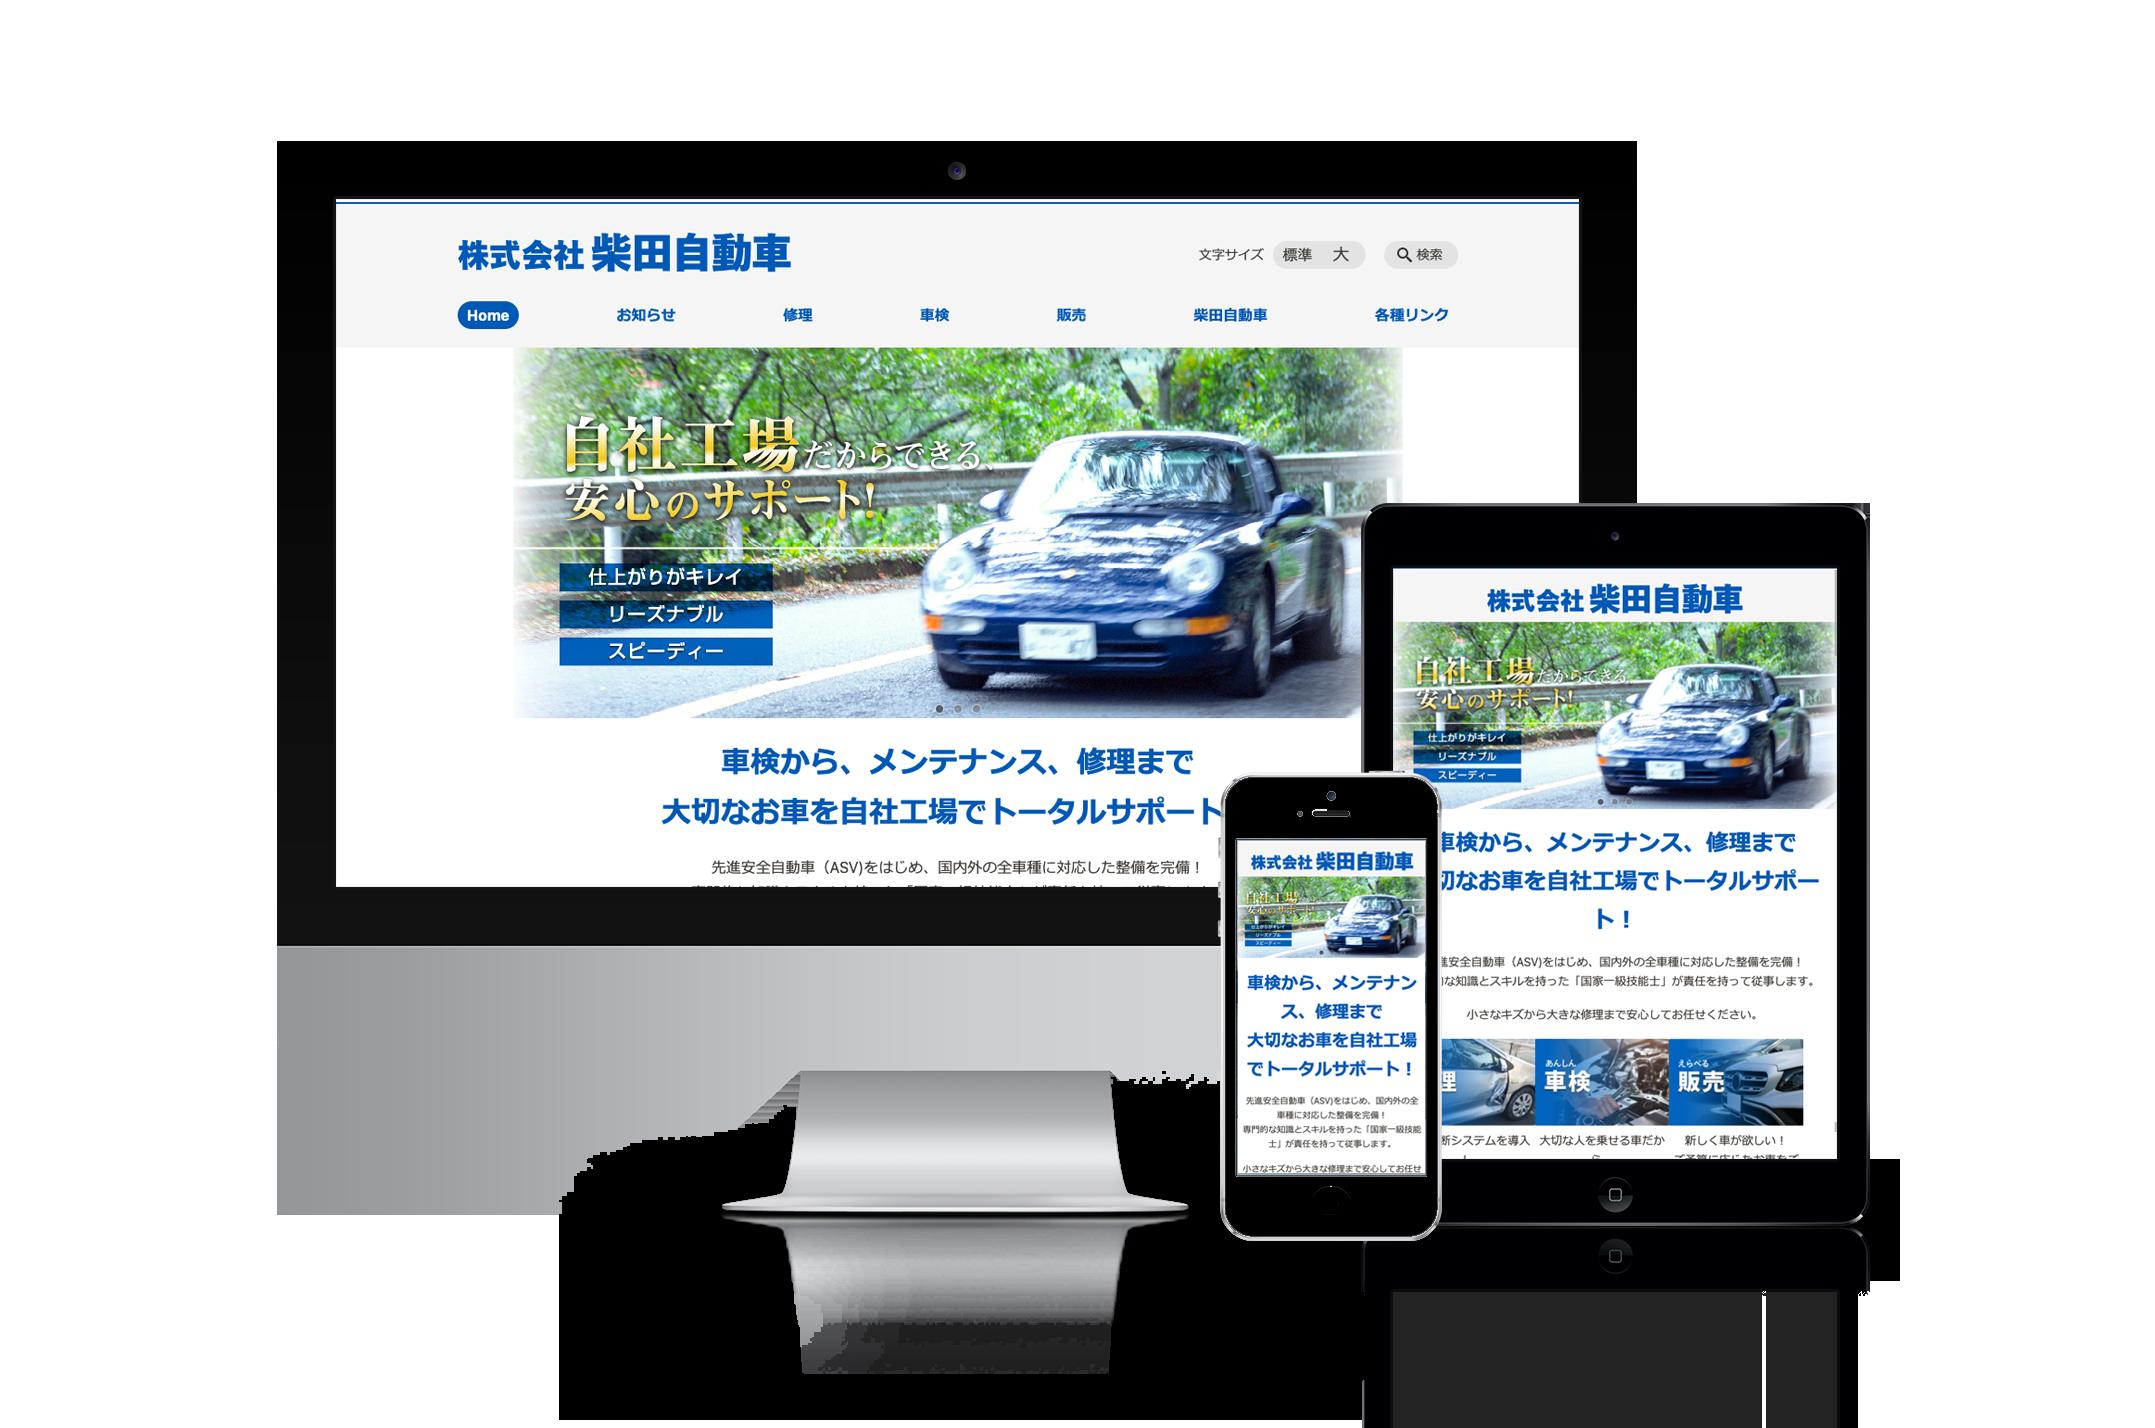 セレサイト制作実績「柴田自動車」